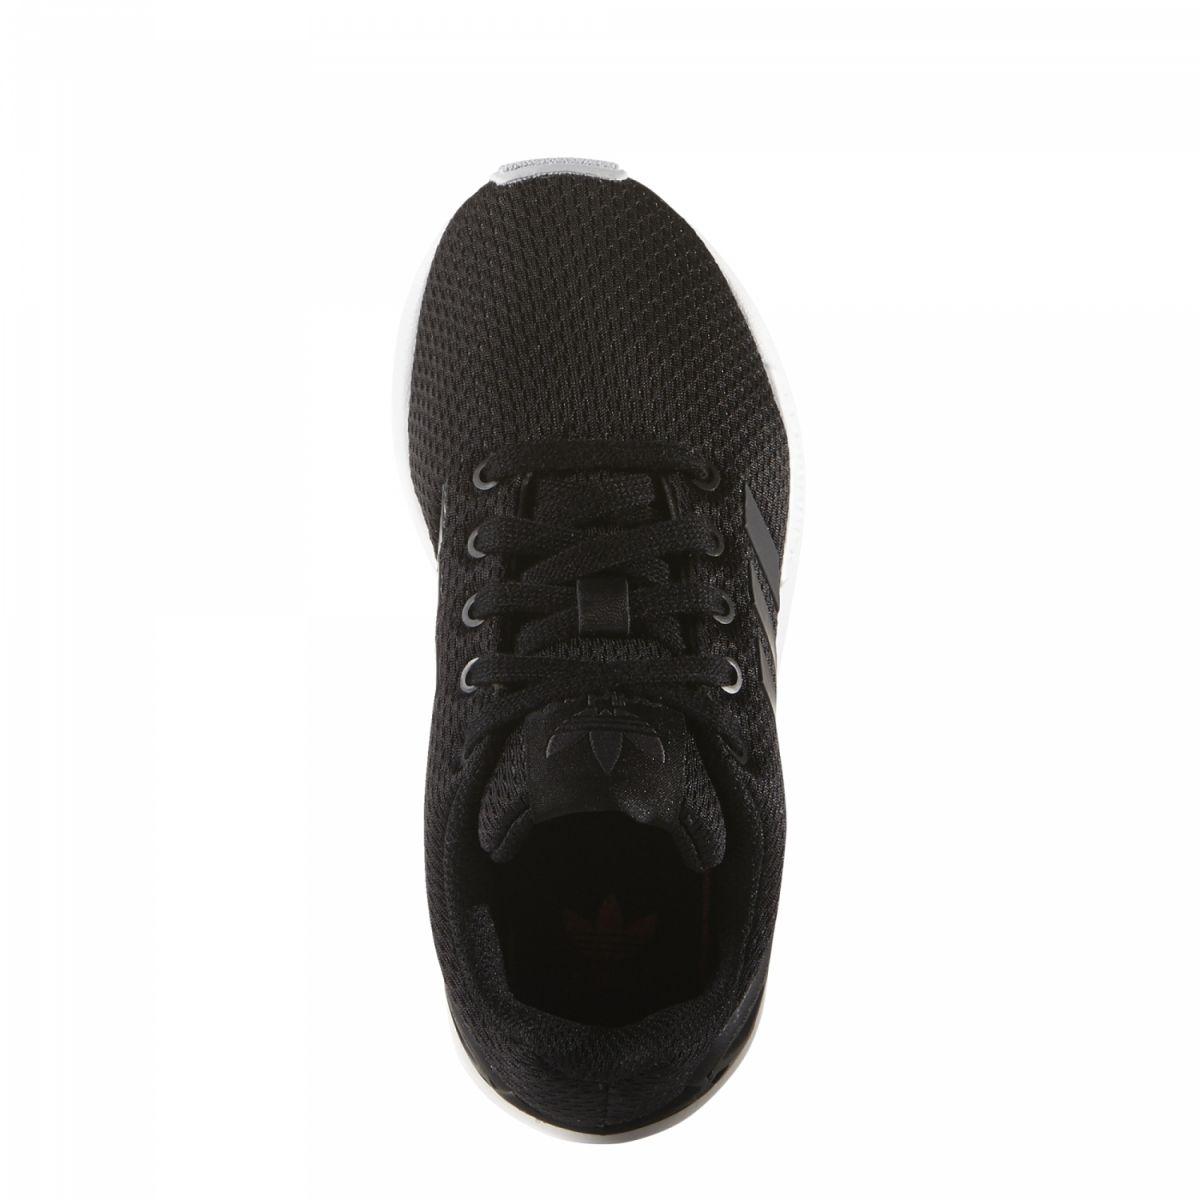 adidas originals zx flux sneaker kinder schuhe schwarz. Black Bedroom Furniture Sets. Home Design Ideas